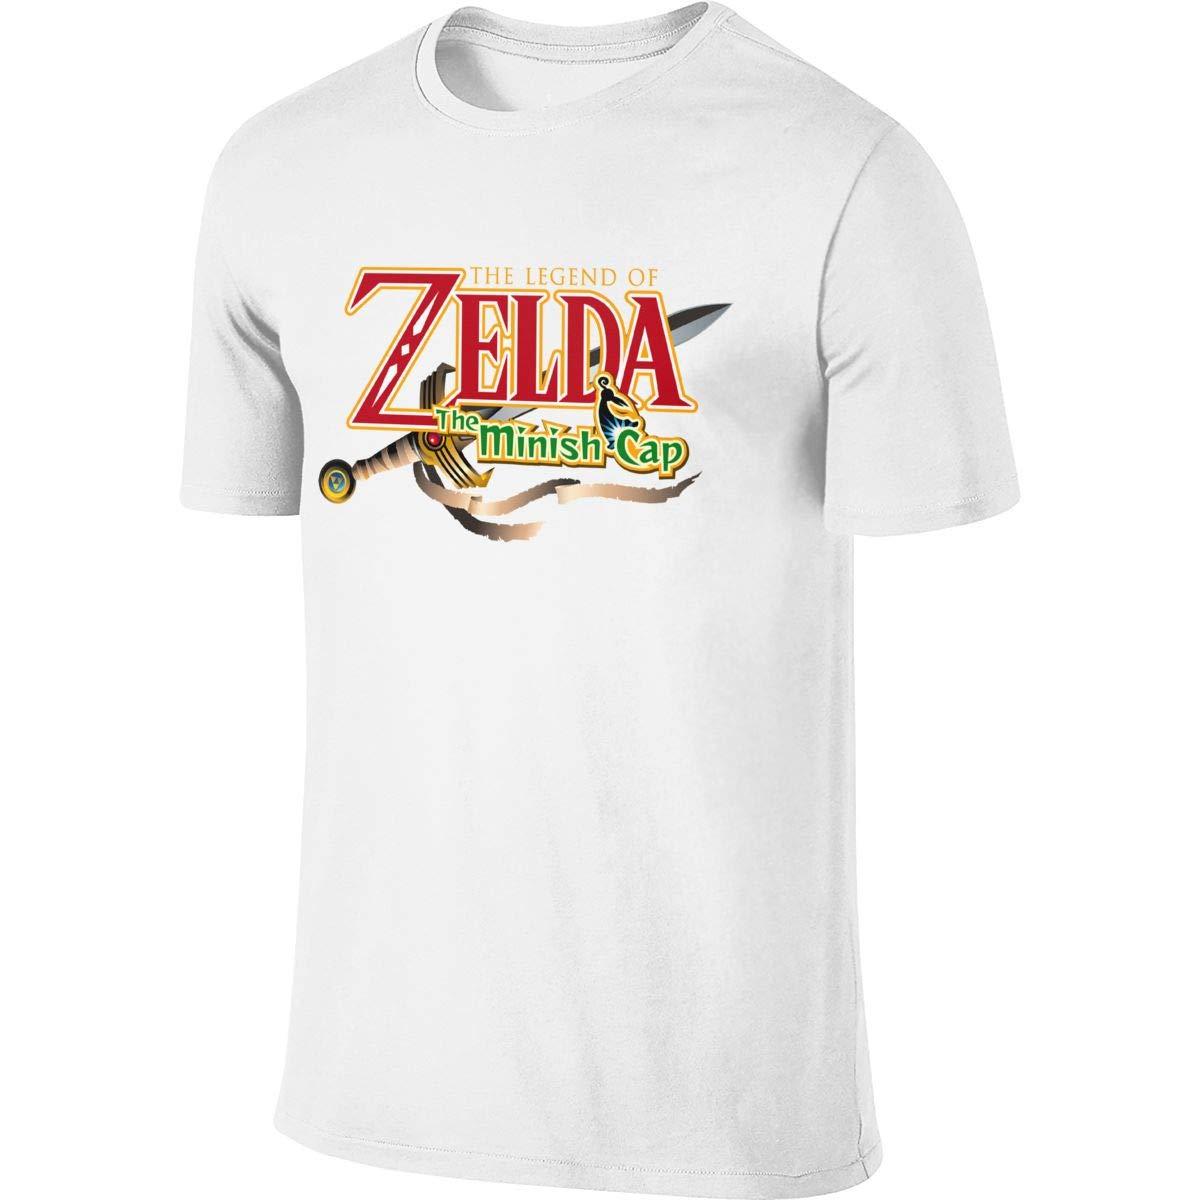 Syins S Customized Fashion Tops The Legend Of Zelda Logo The Minish Cap T Shirts